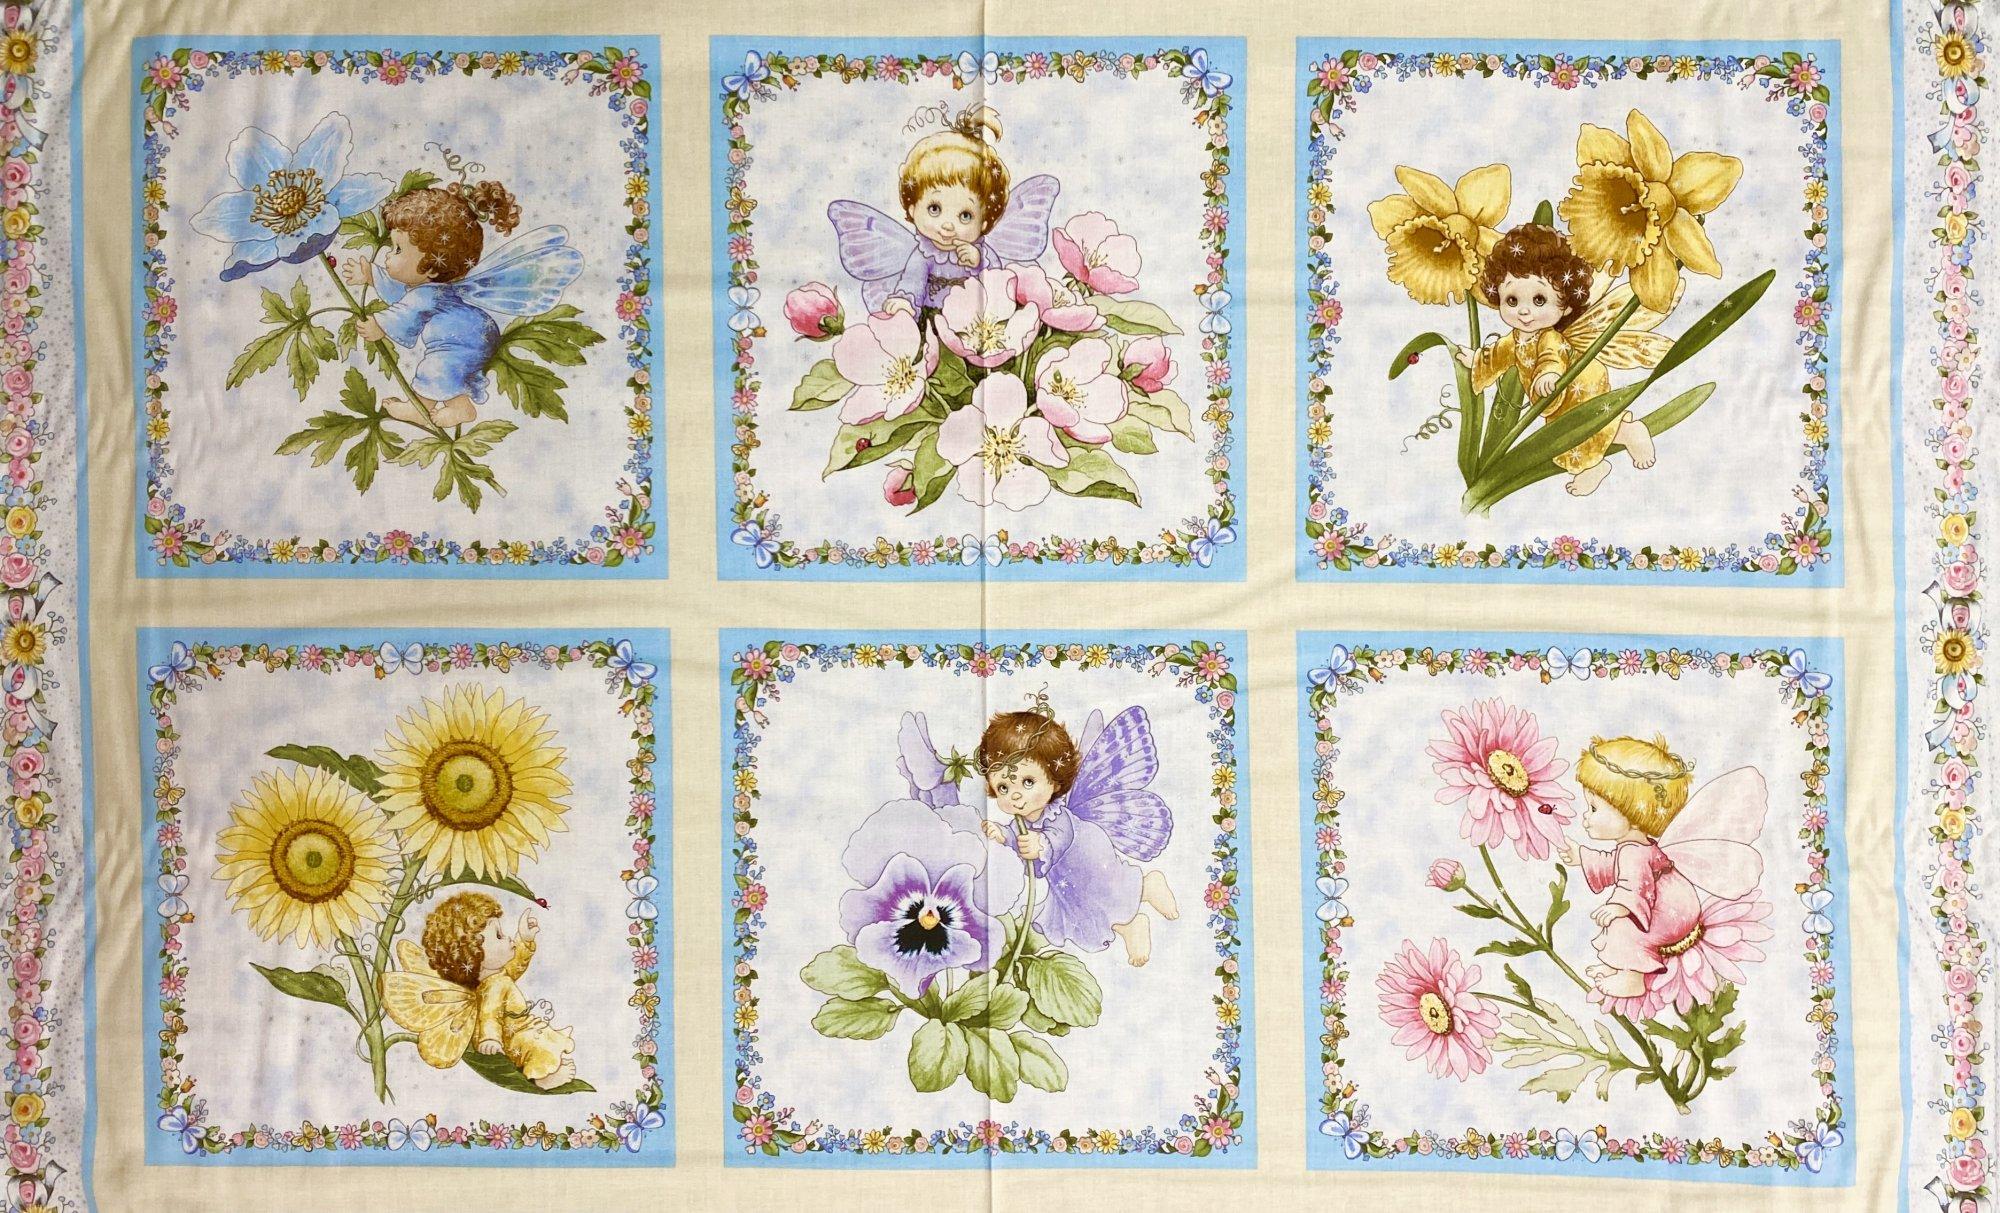 Angels & Fairies 6 Block Panel